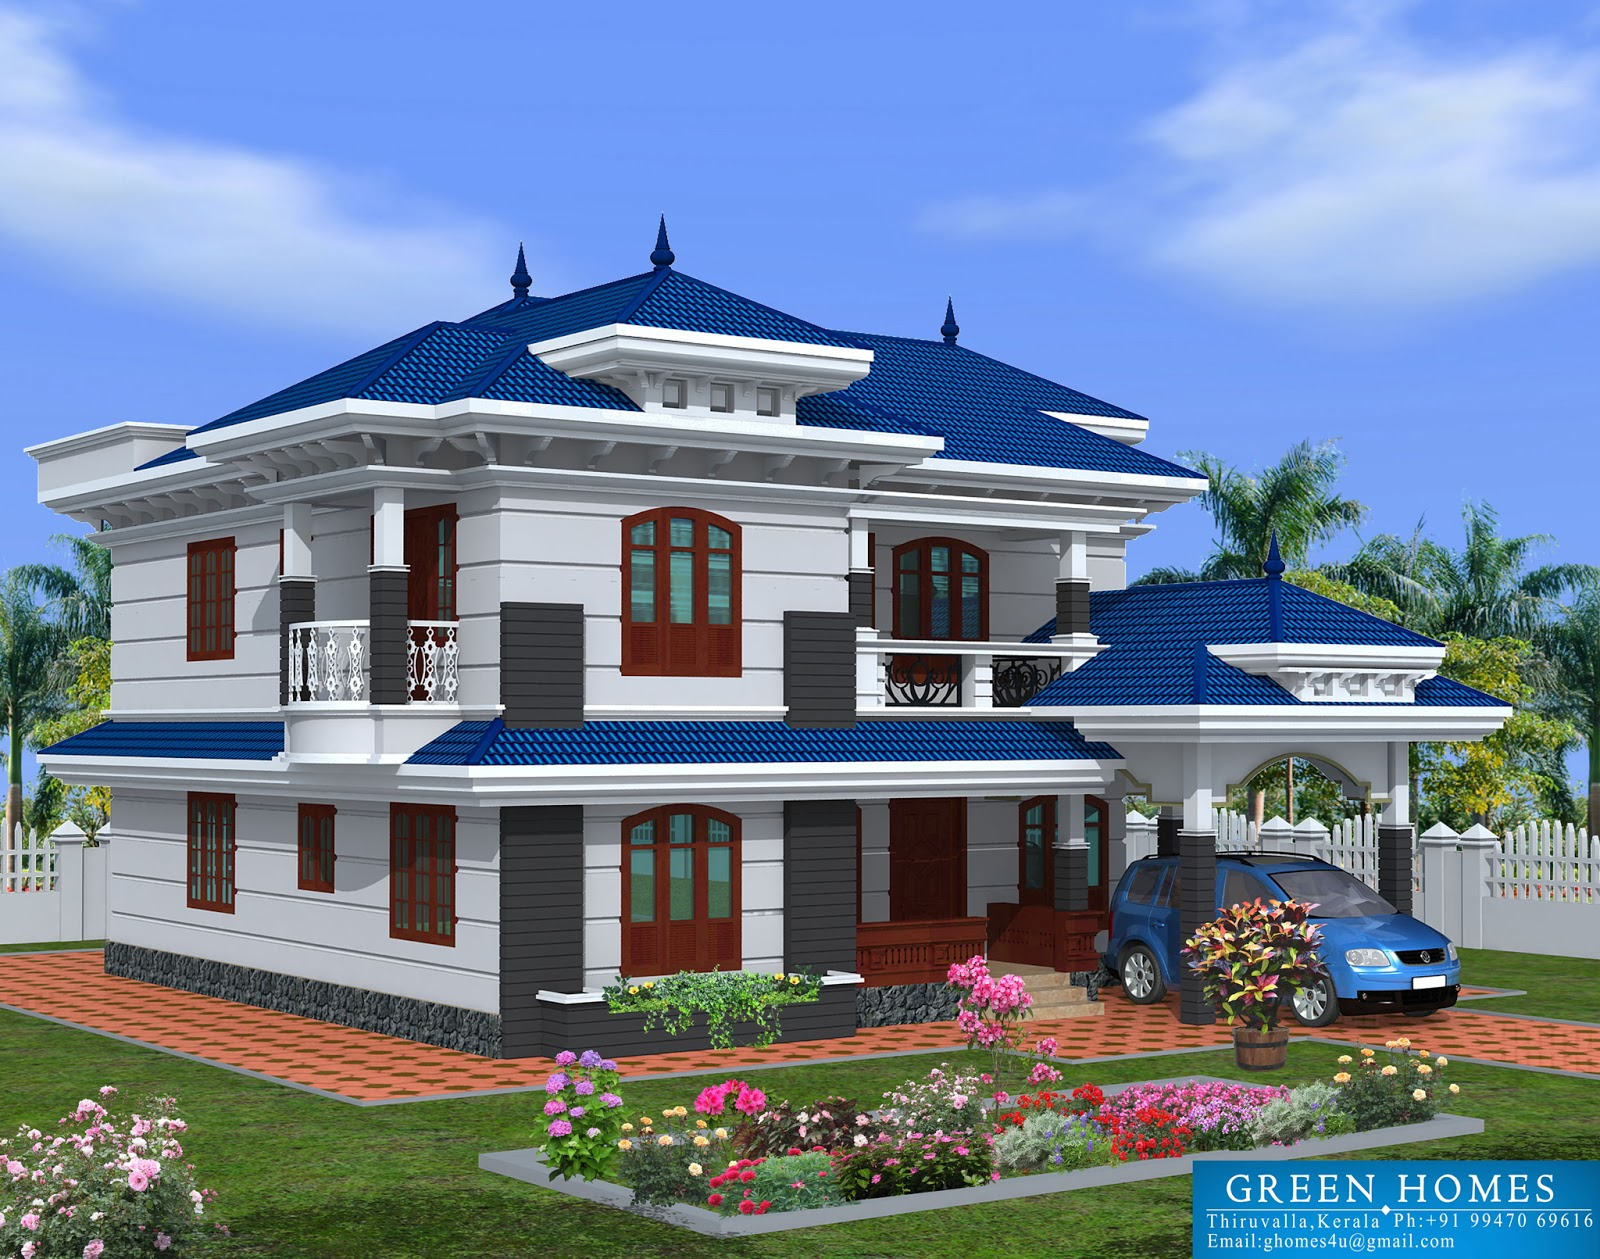 Green Homes Beautiful Kerala Home Design2222sqfeet